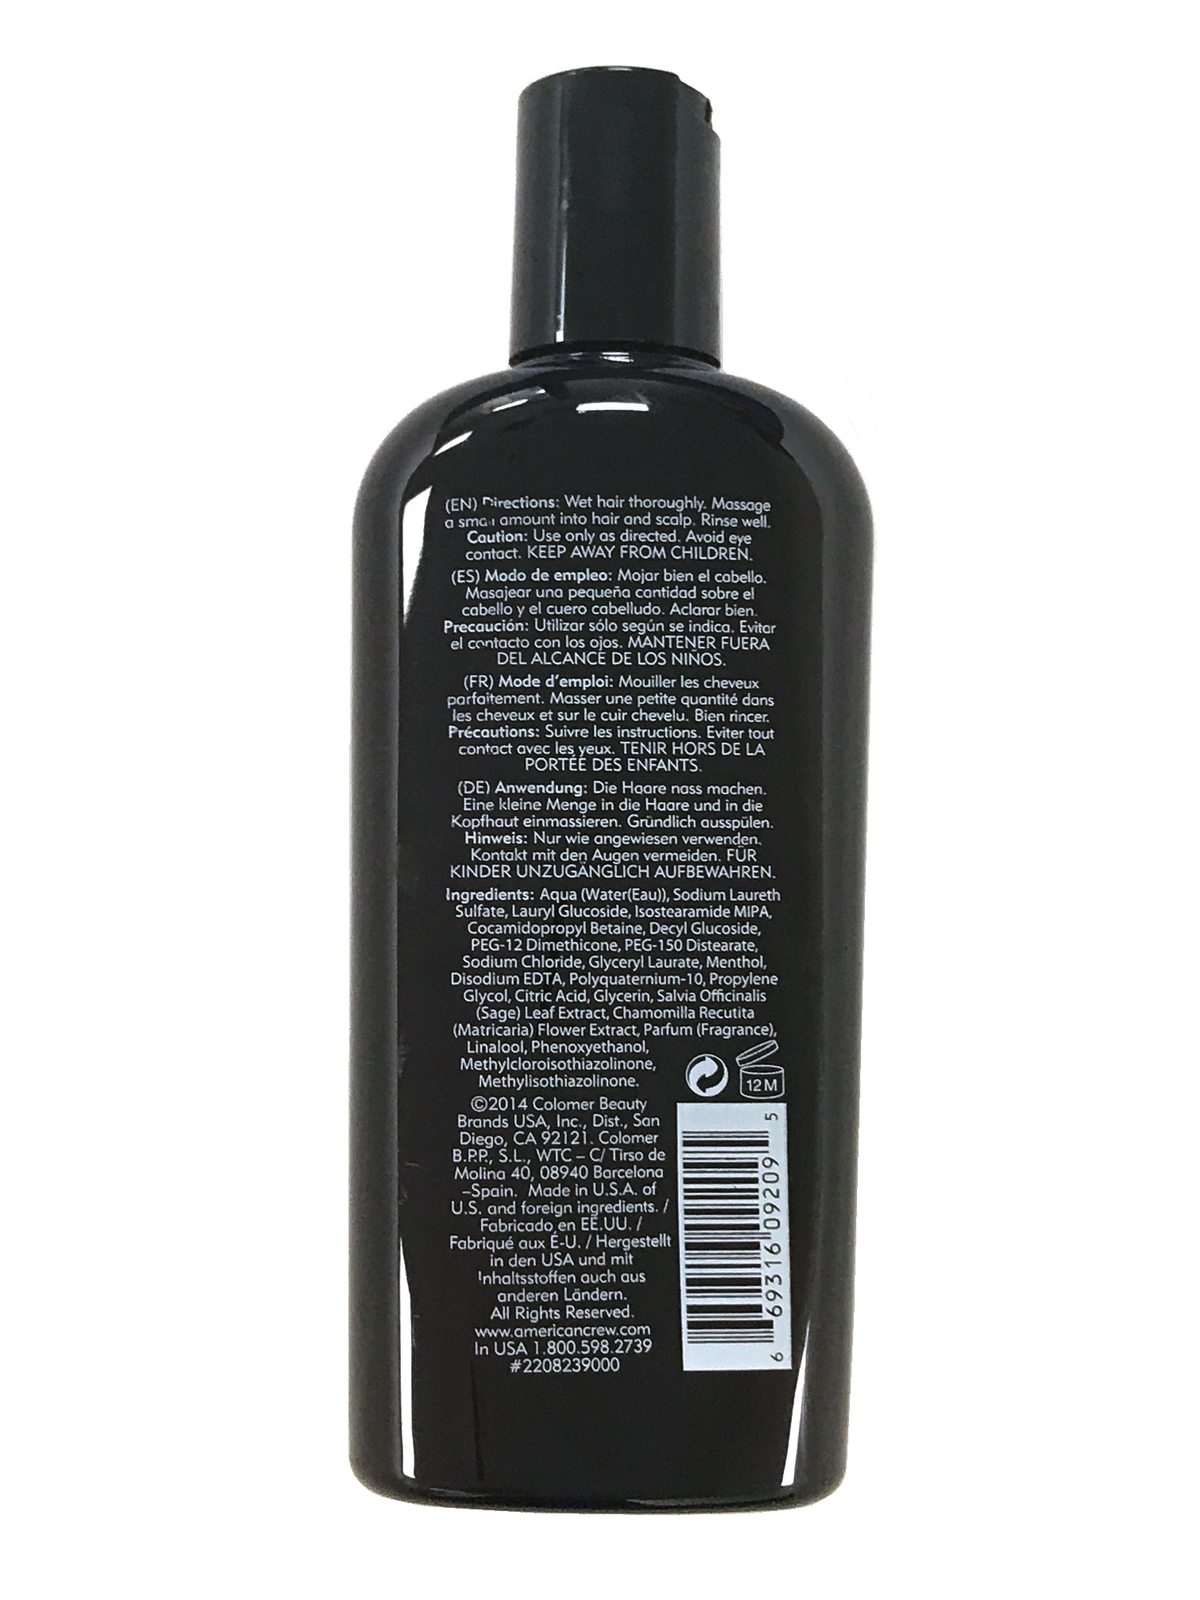 Americancrew shampoo2095  1